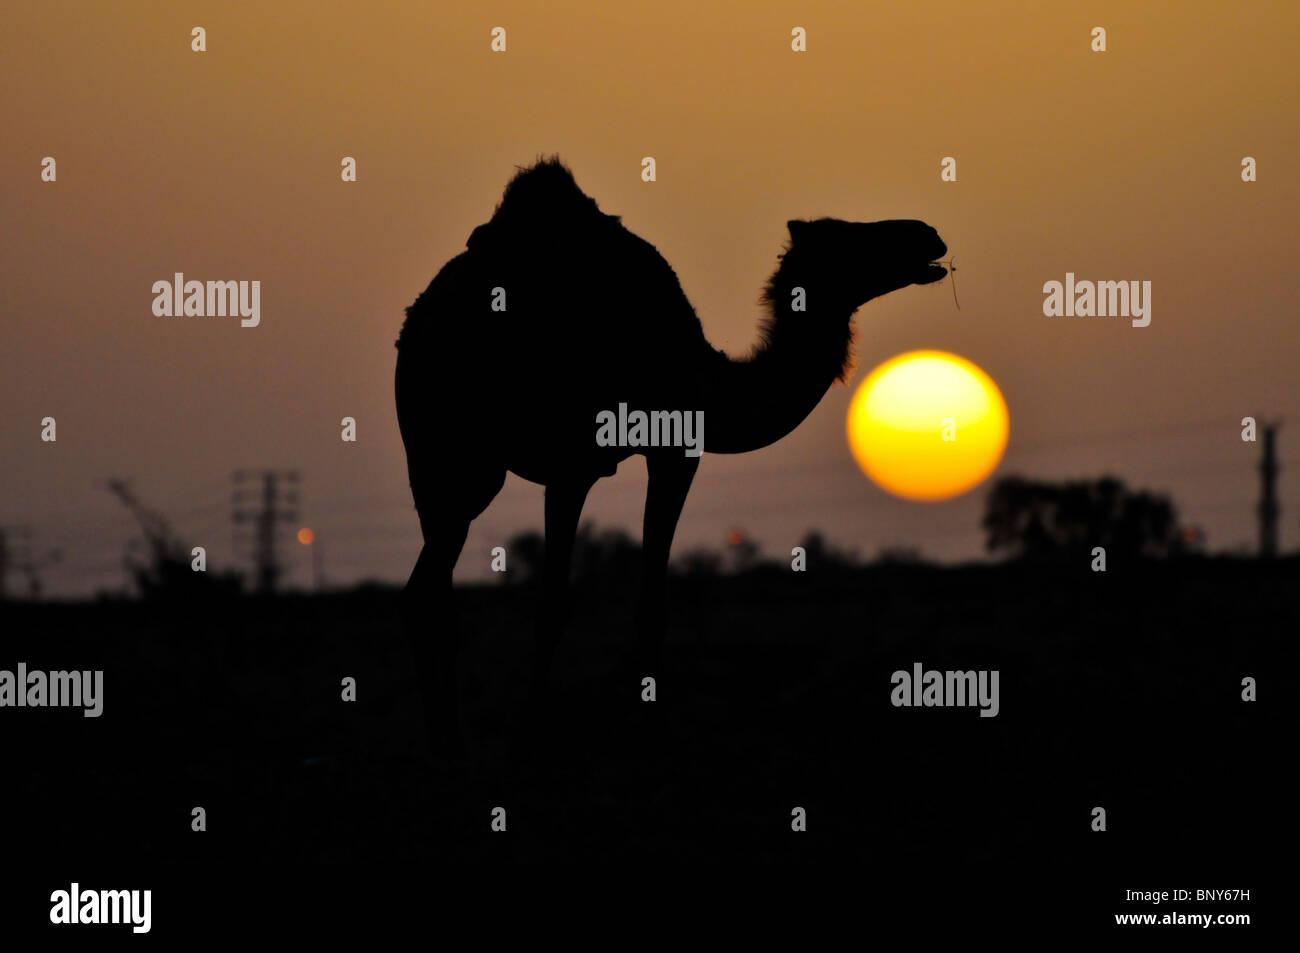 Israel, Negev Deset, silhouette of an Arabian camel (Camelus dromedarius) at subset Stock Photo